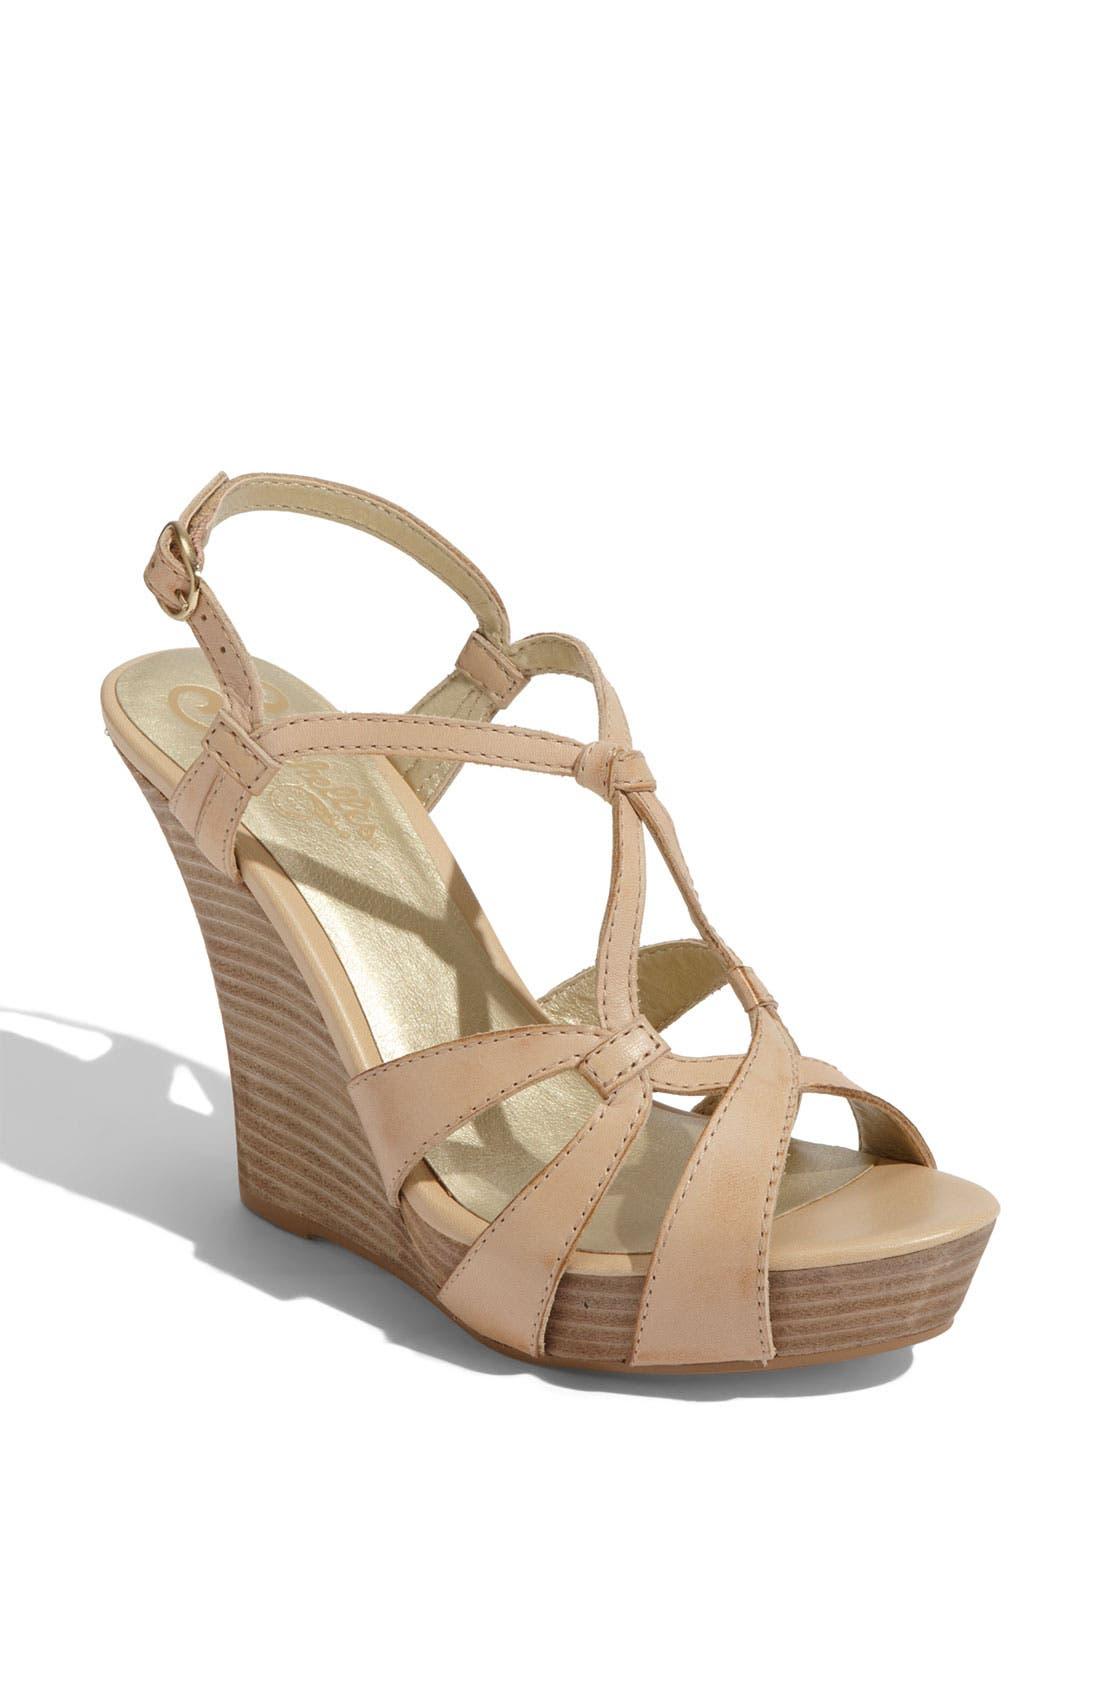 Main Image - Seychelles 'Purr' Wedge Sandal